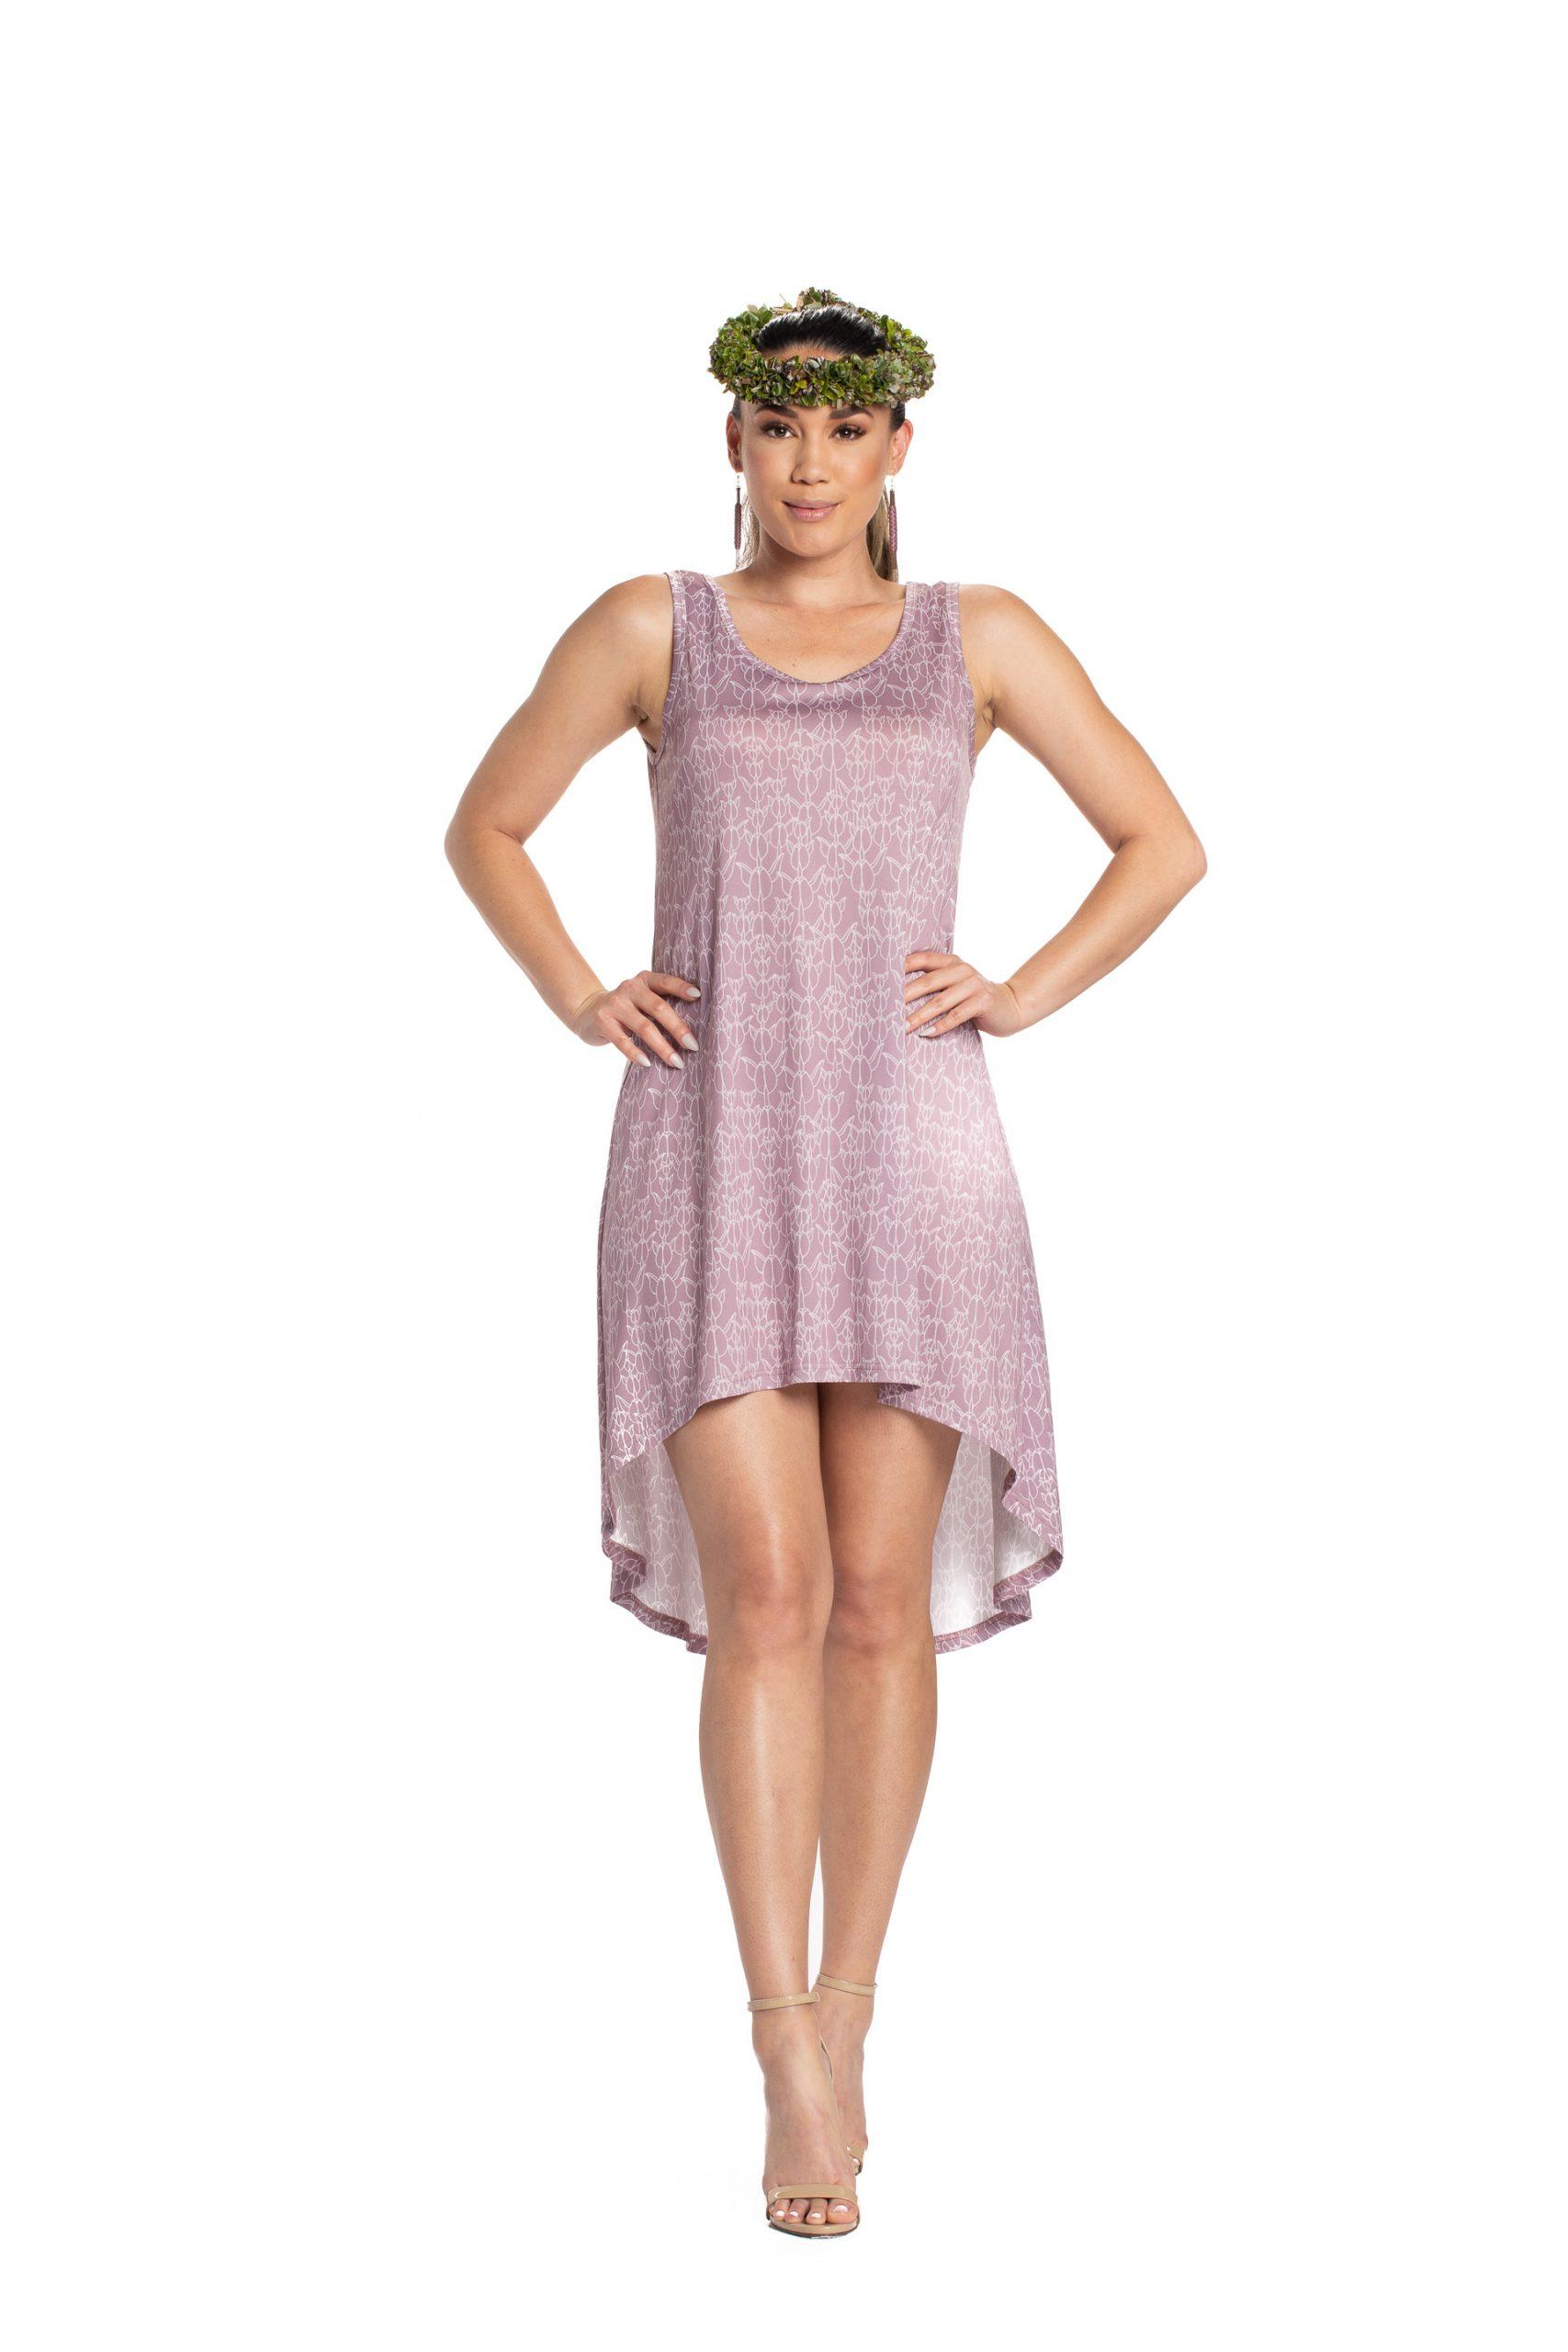 Model wearing a Waikoloa High Low Dress - Front View